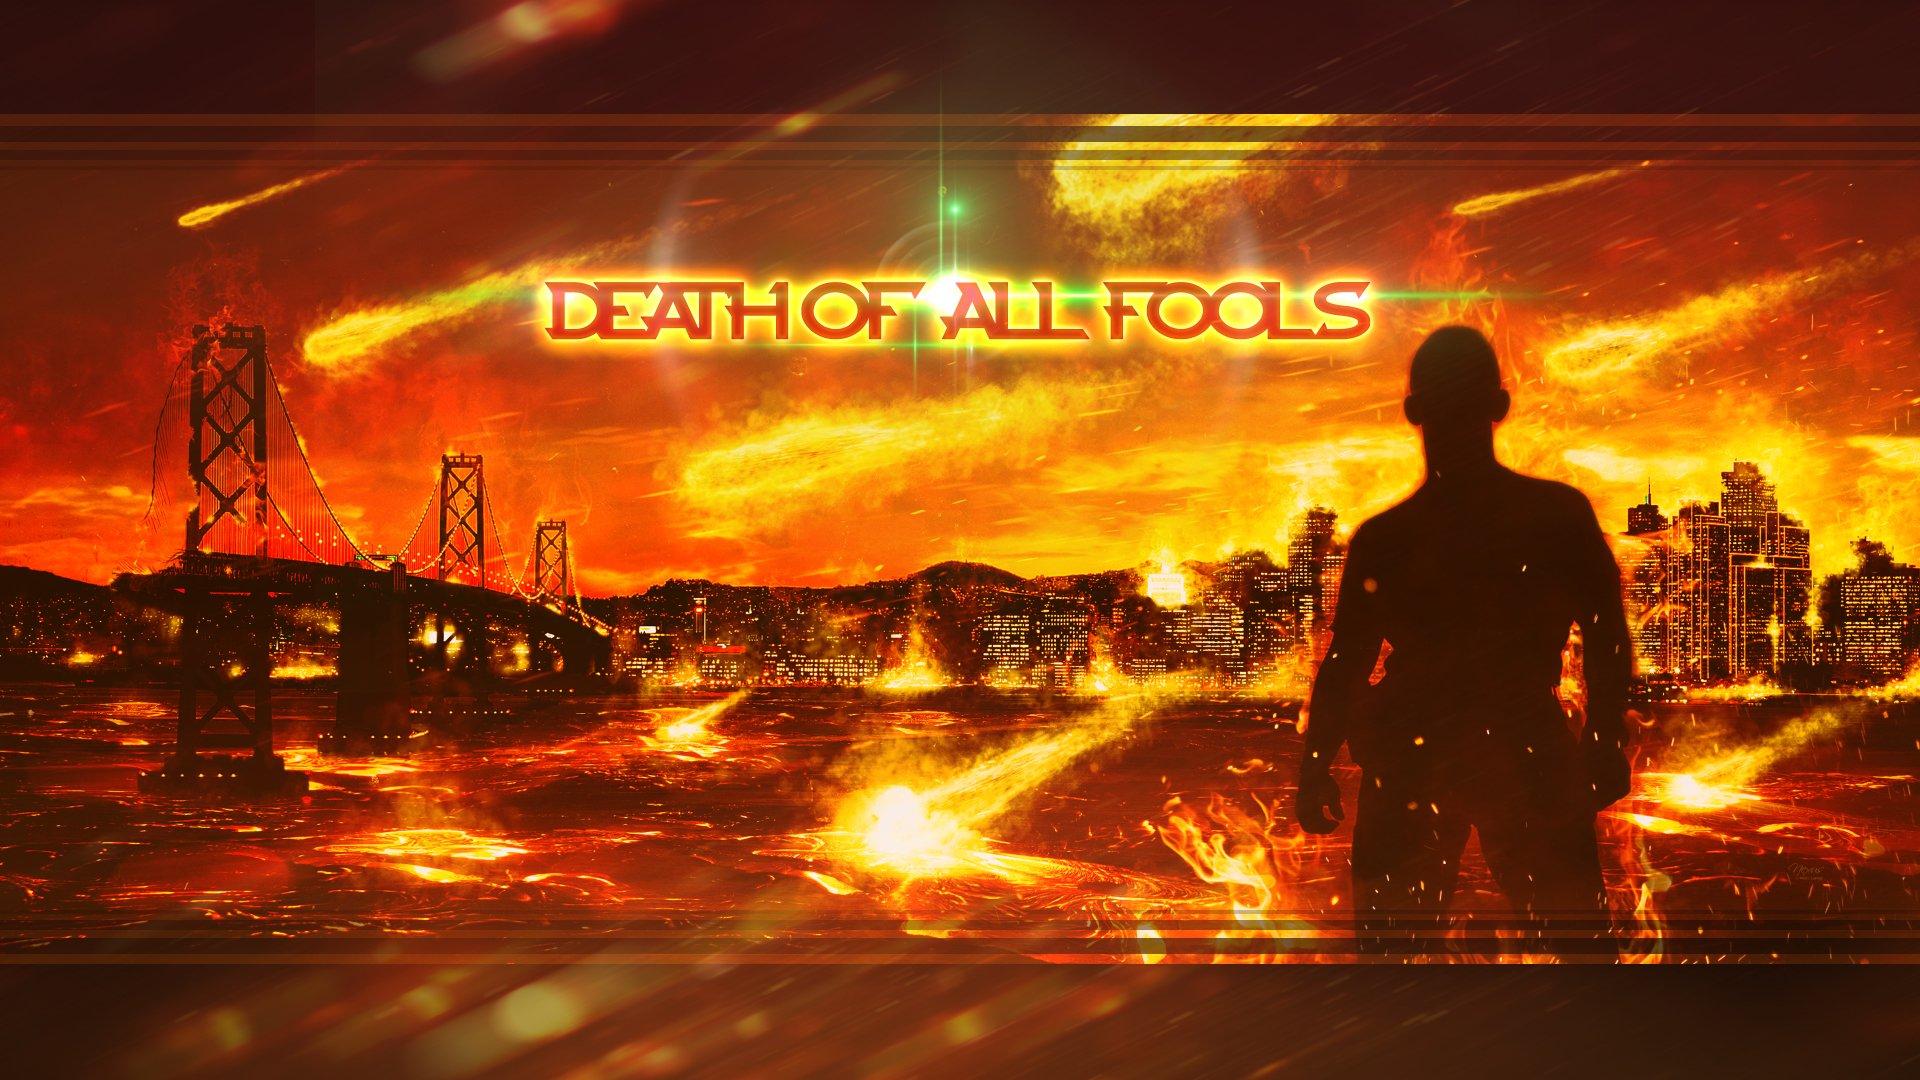 Apocalypse City Fire Death Of All Fools 4k ...